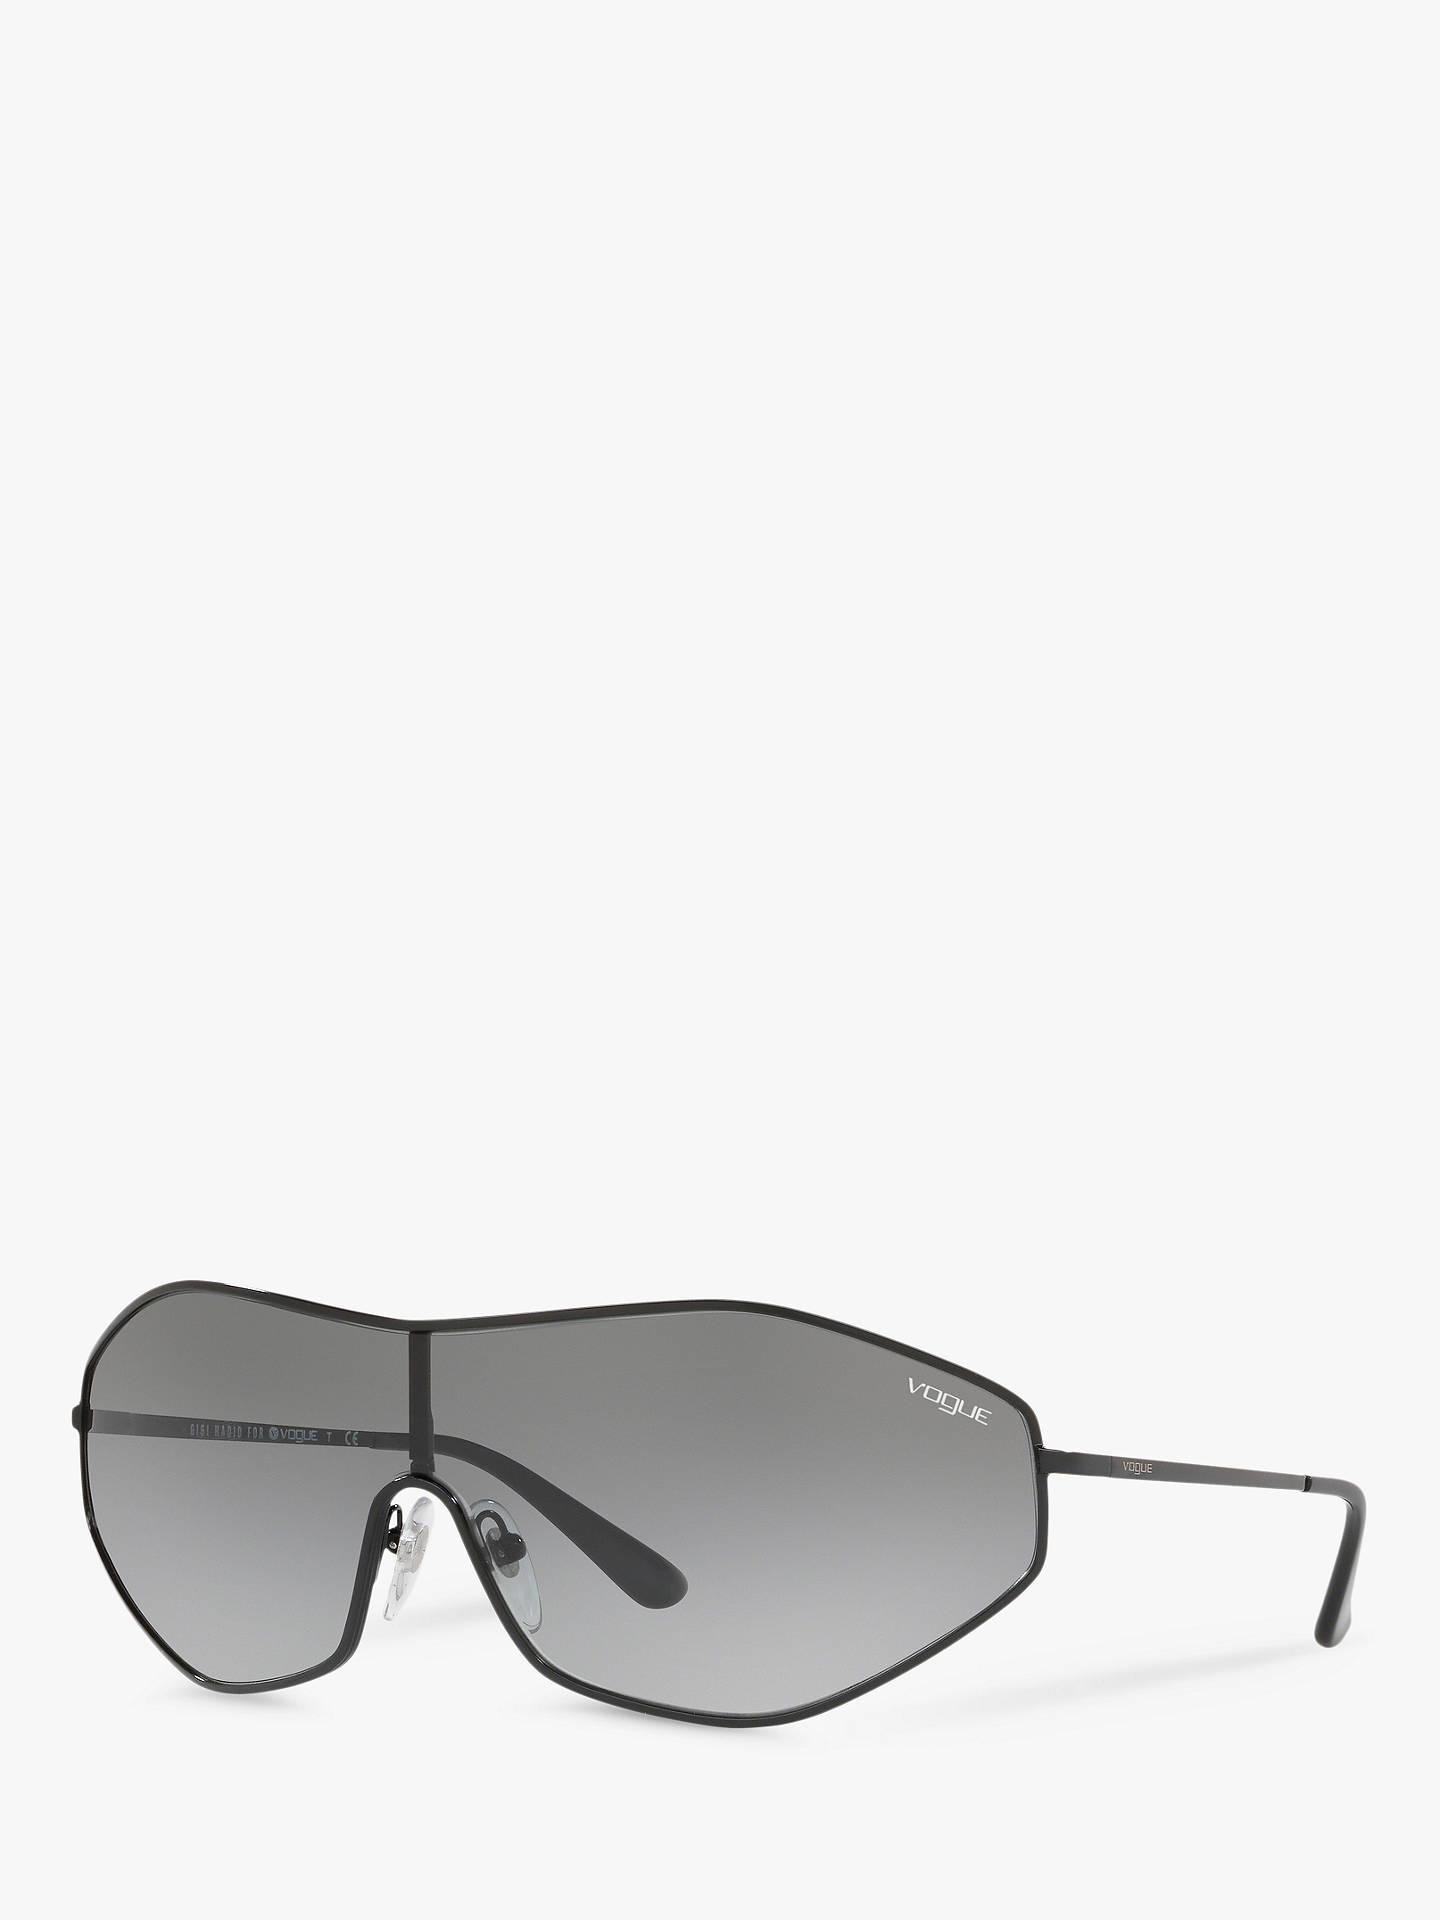 138baefbbe1 Vogue VO4137S Women s Rectangular Sunglasses at John Lewis   Partners